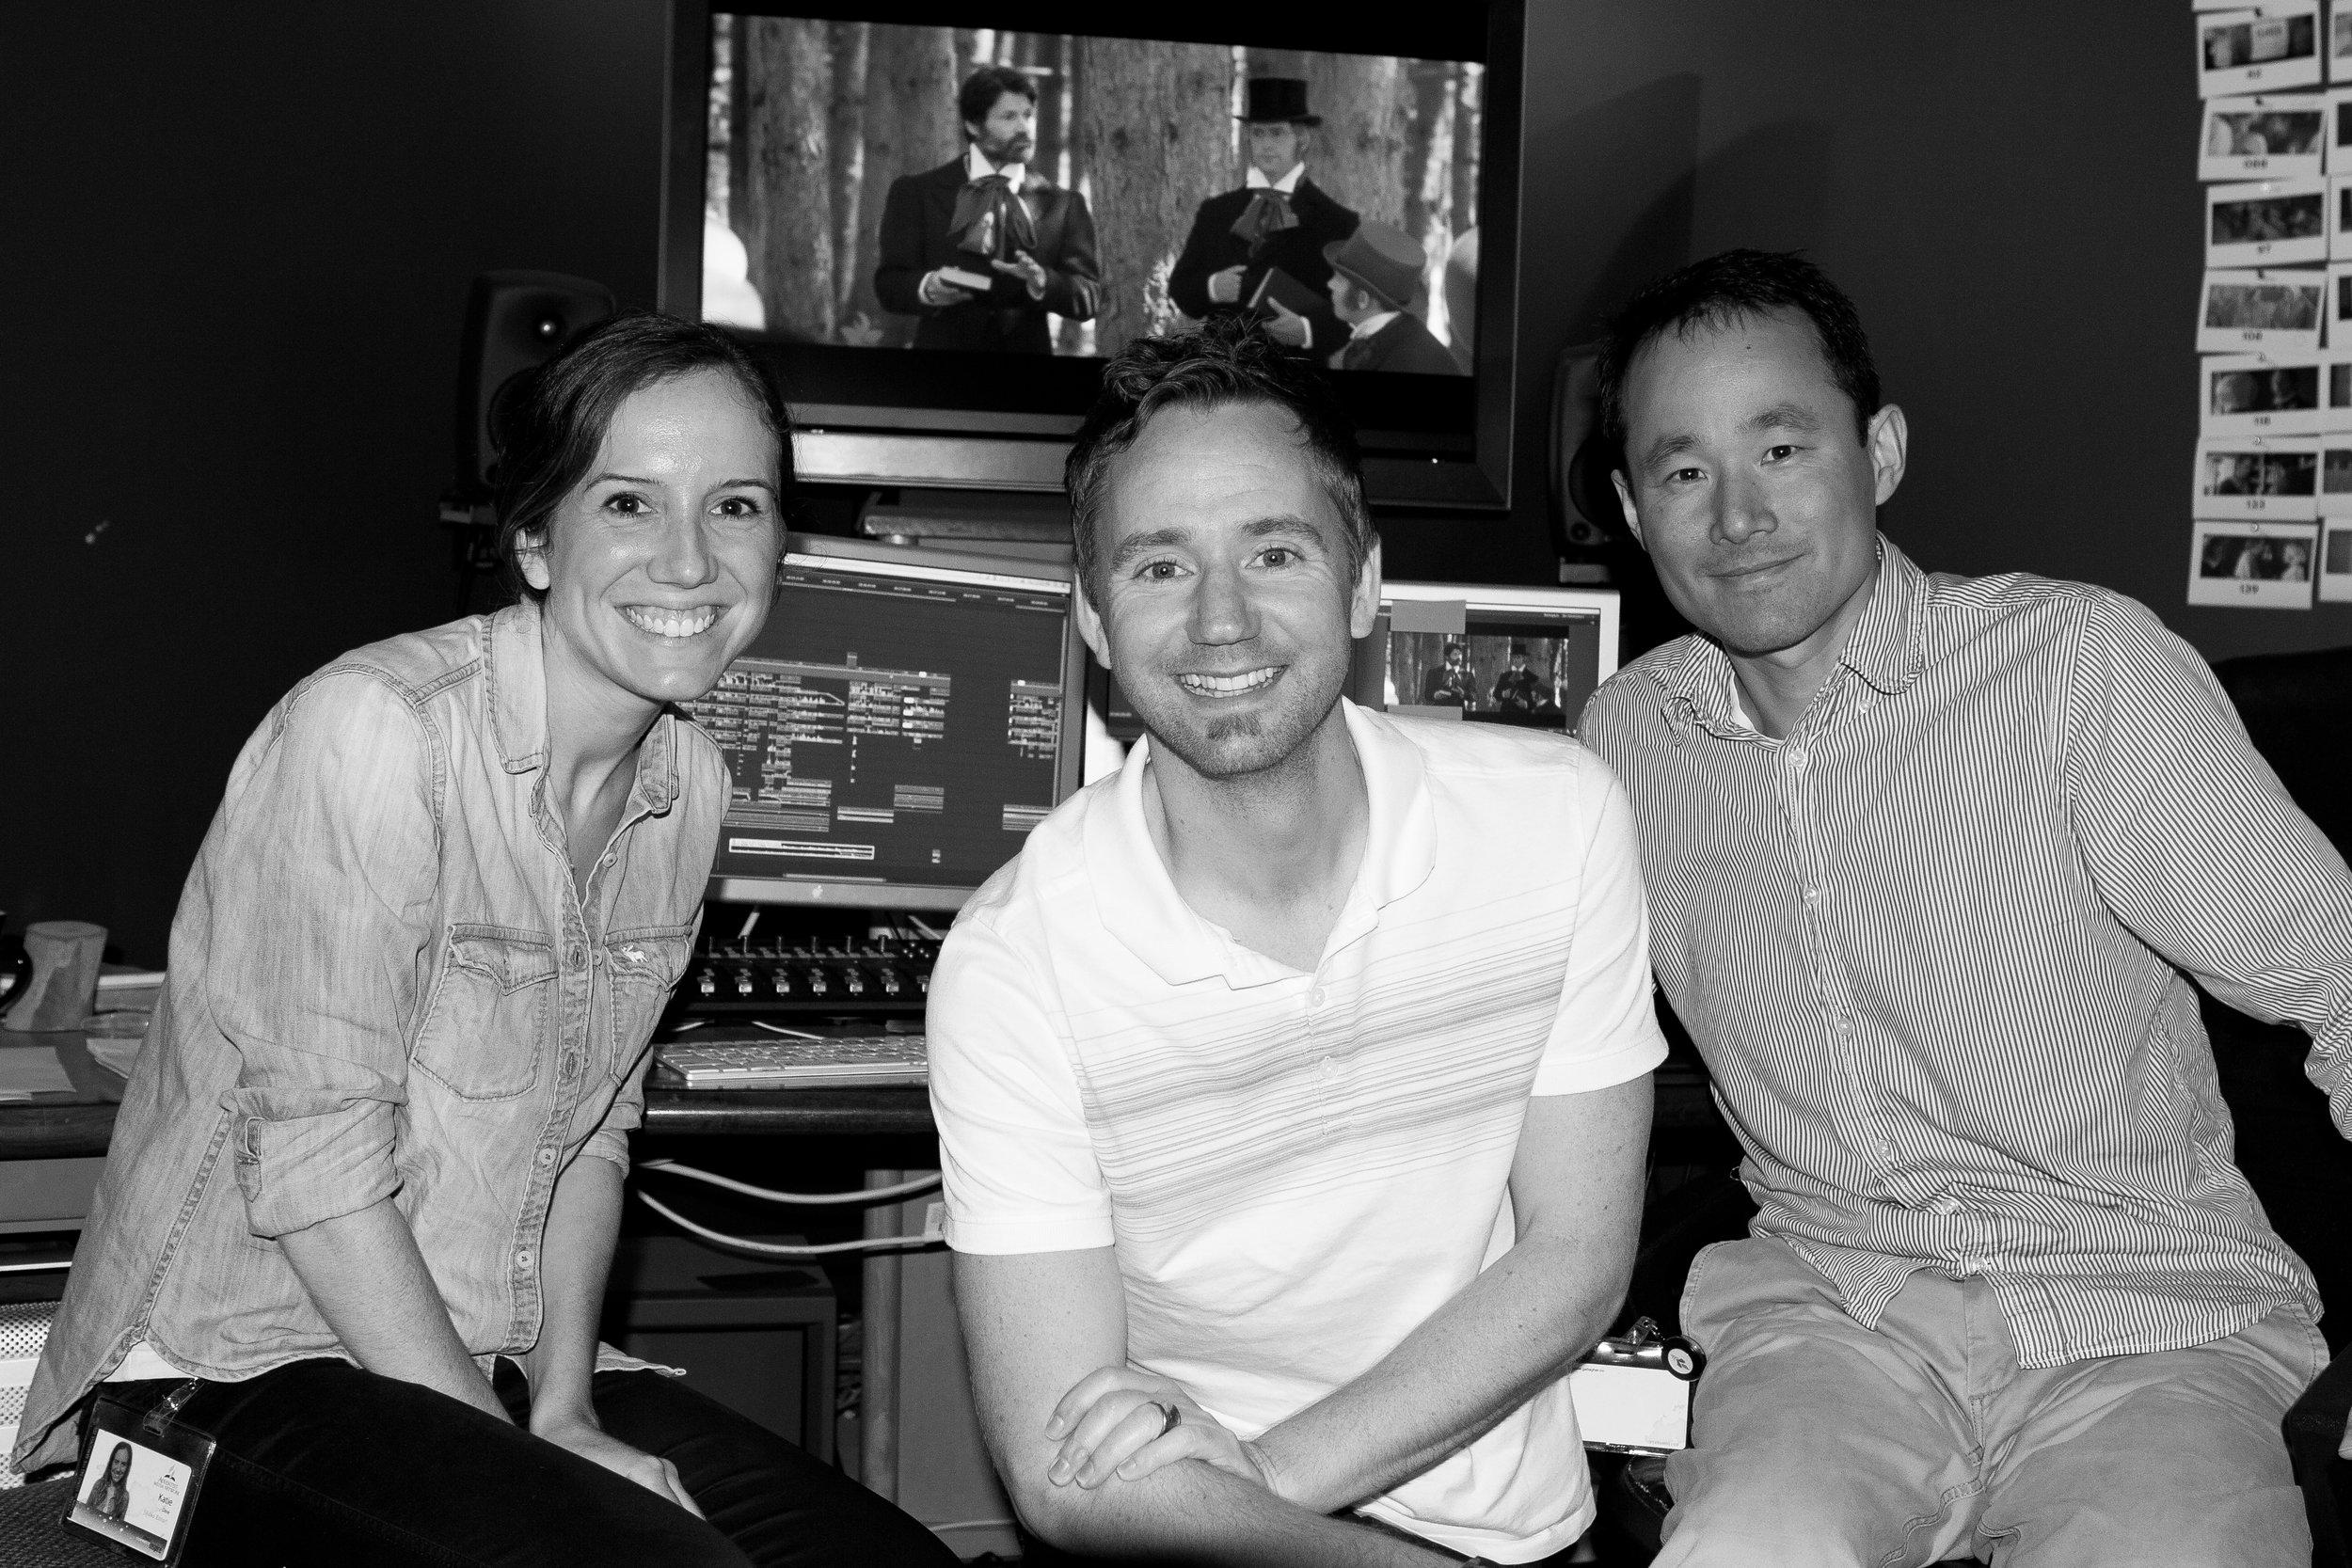 L-R - Katie Dose (1st Assistant Editor), Emmy Awarding winner Kyle Portbury (Writer Director), Bin Li (Film Editor)